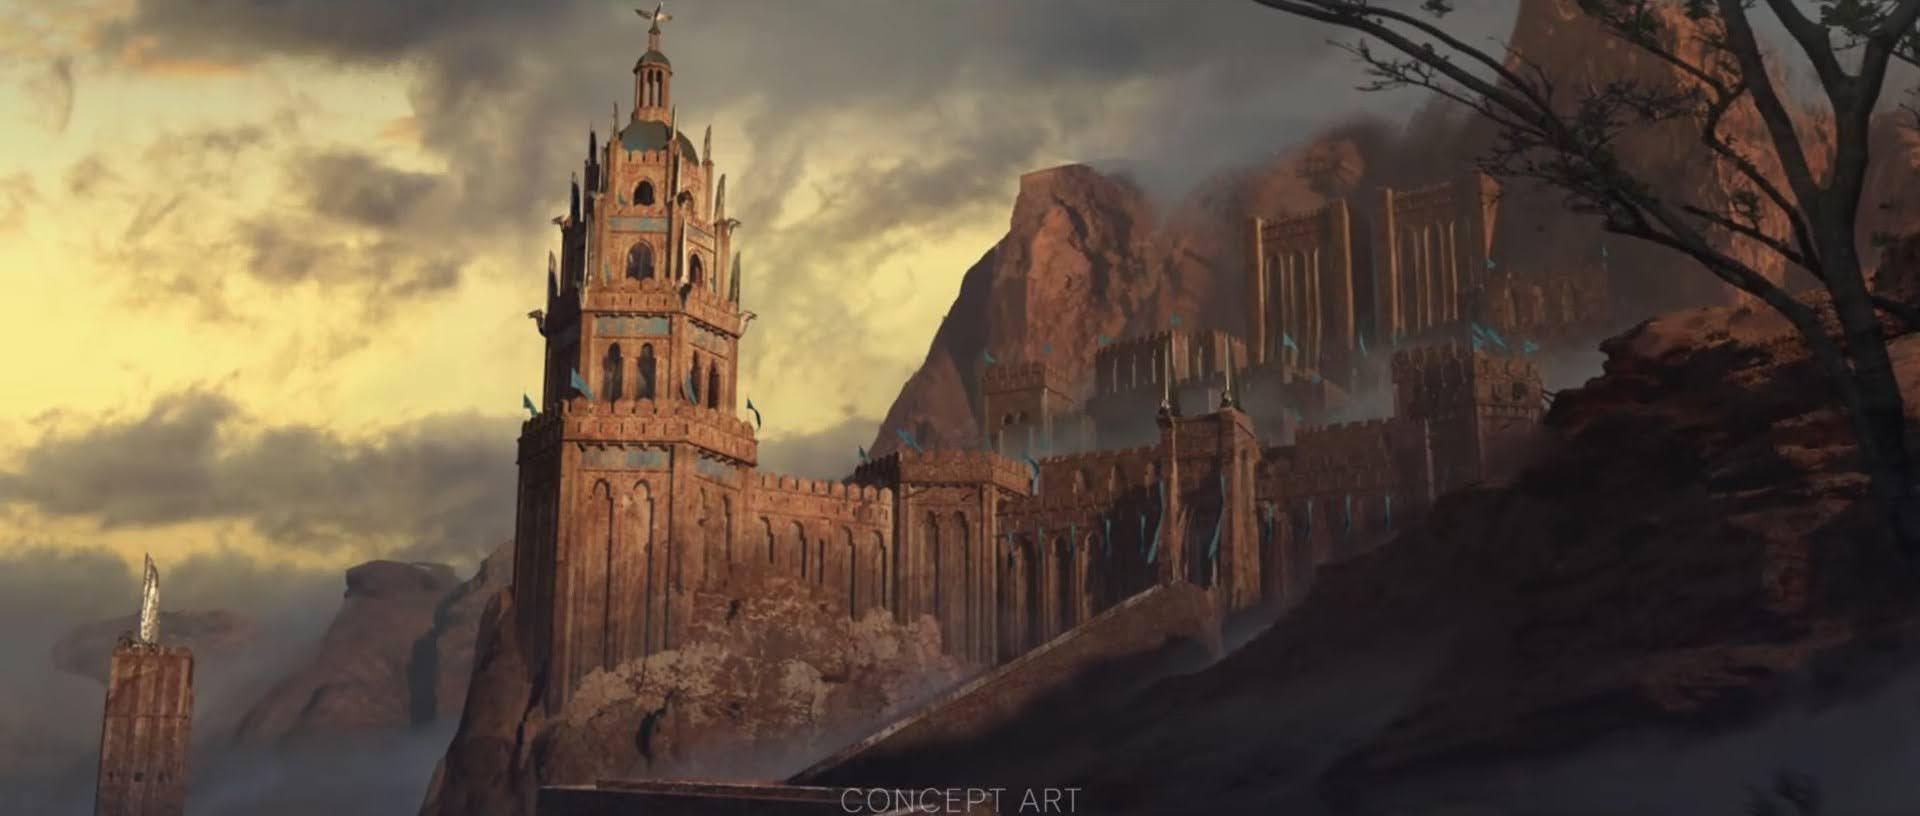 Next DA Concept Art 6